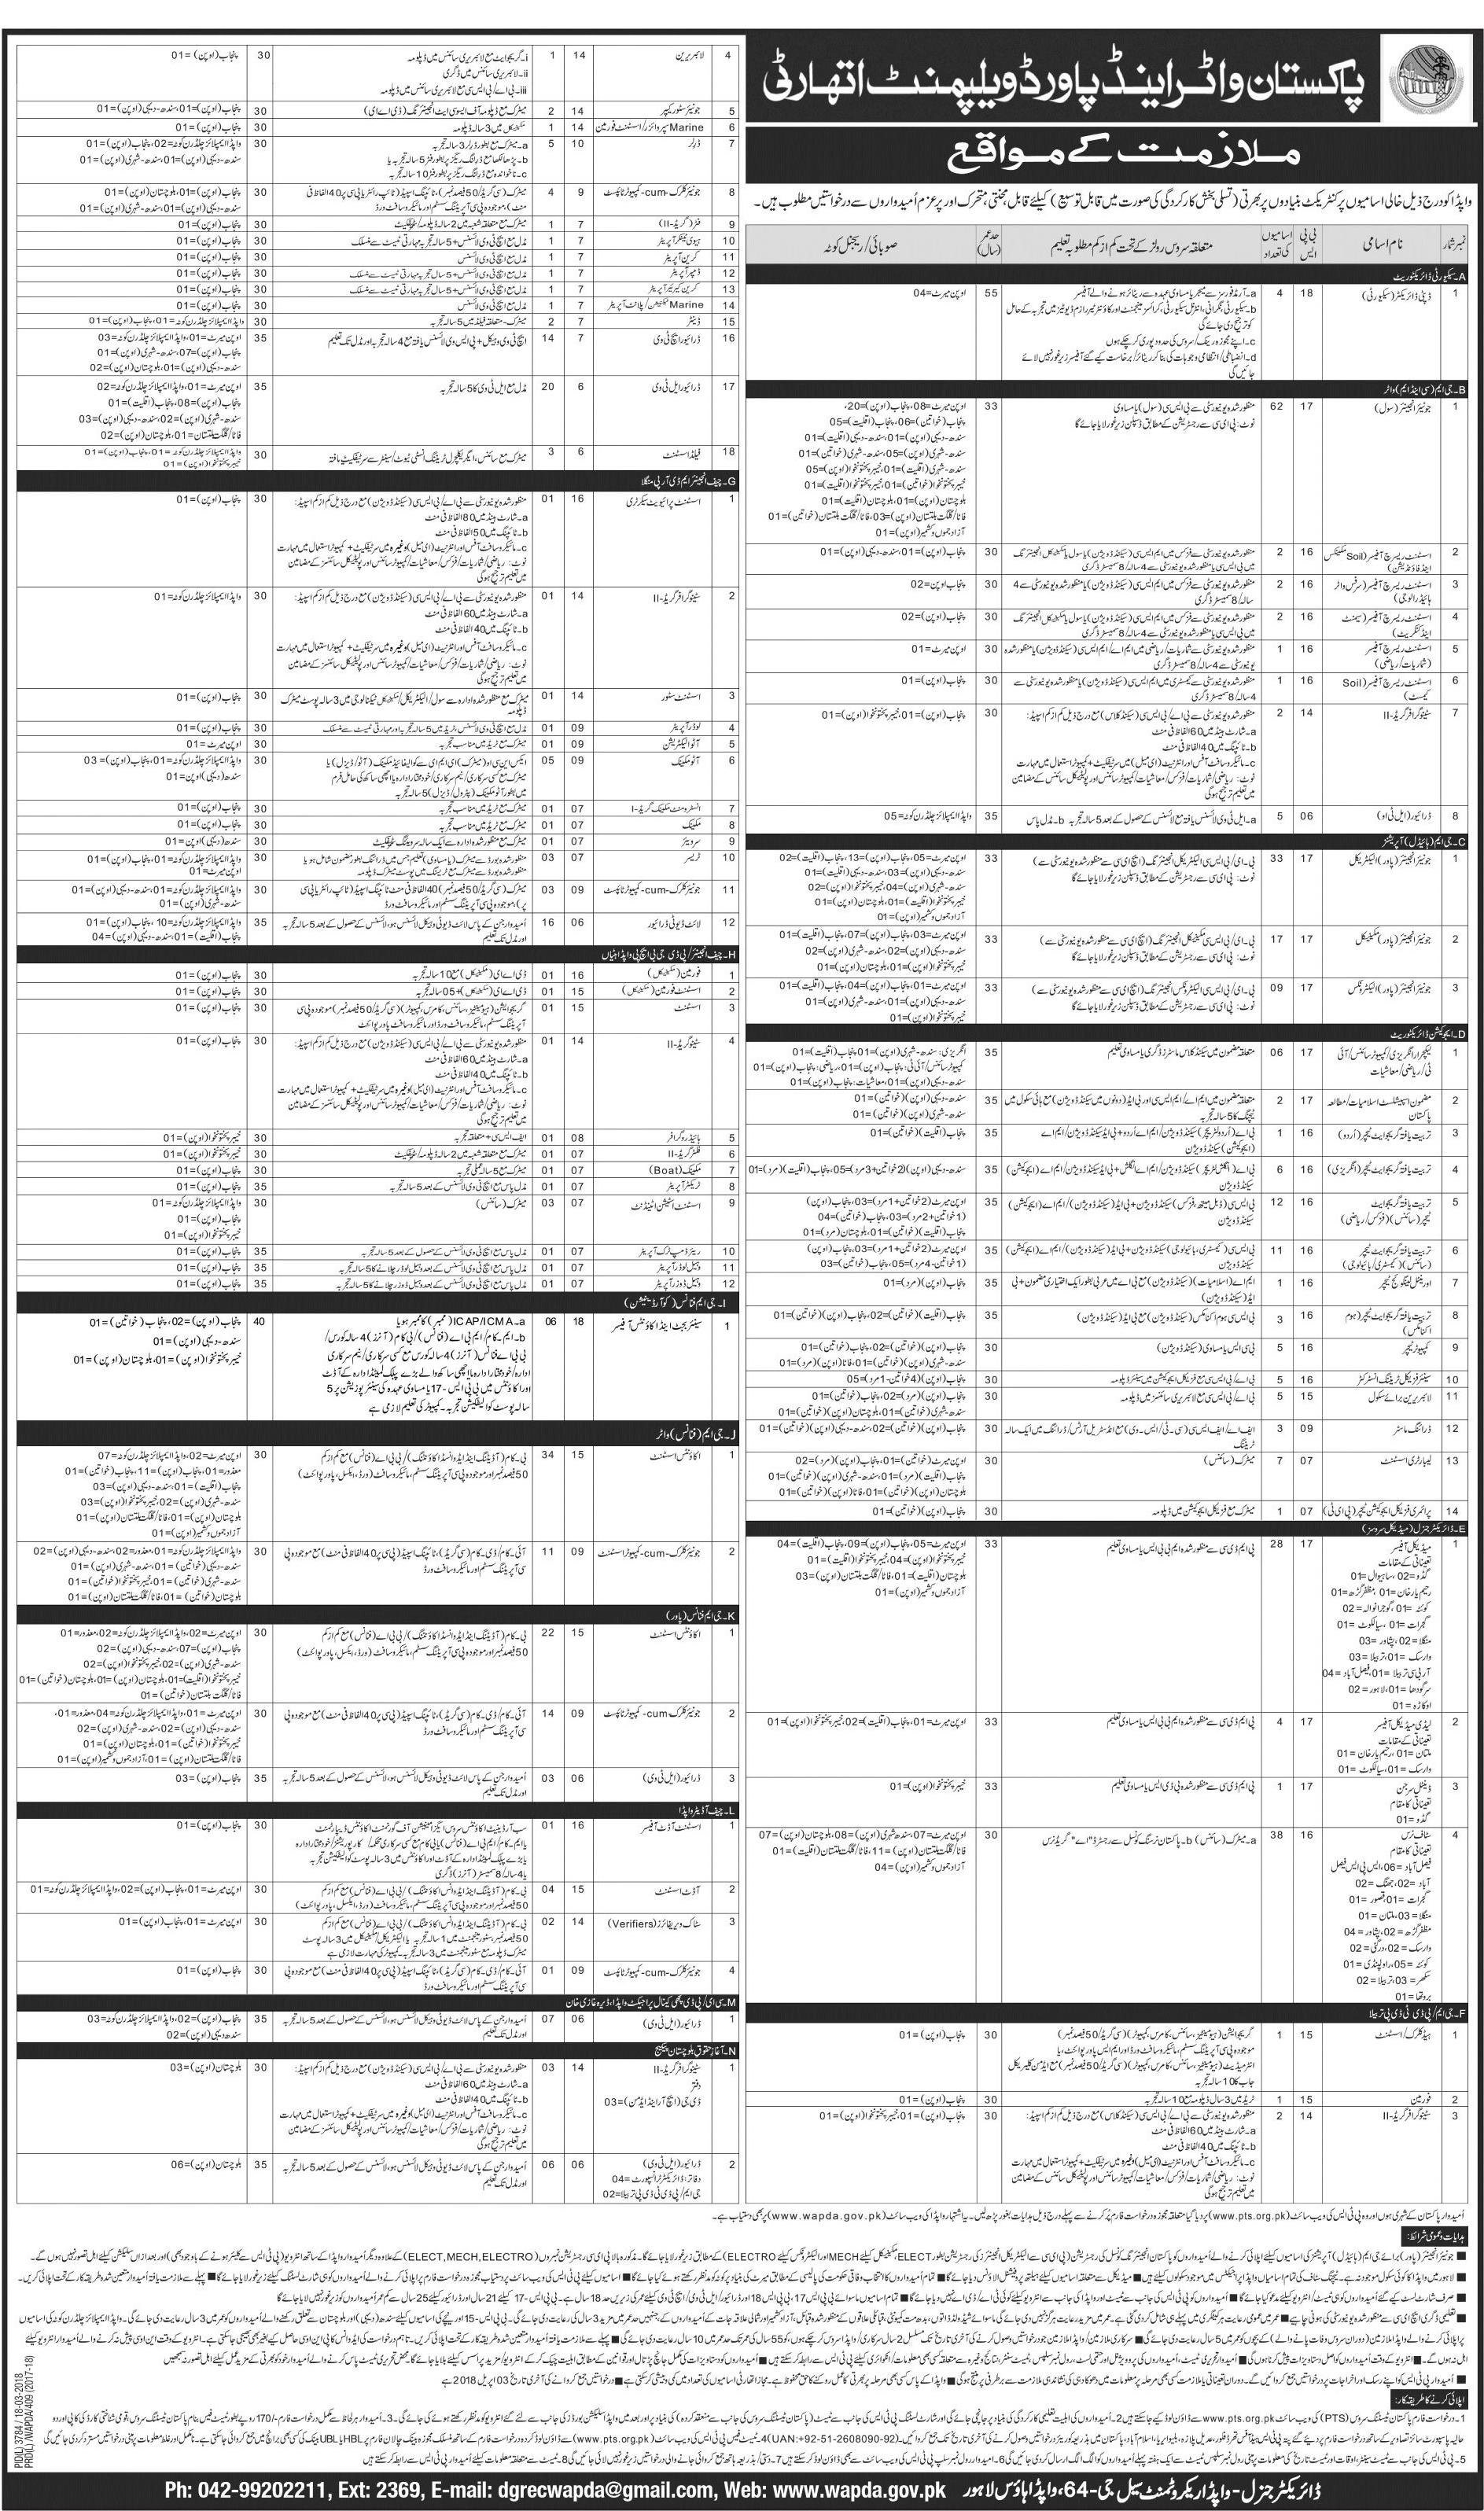 WAPDA Jobs In Pakistan 2018 PTS Application Form Online